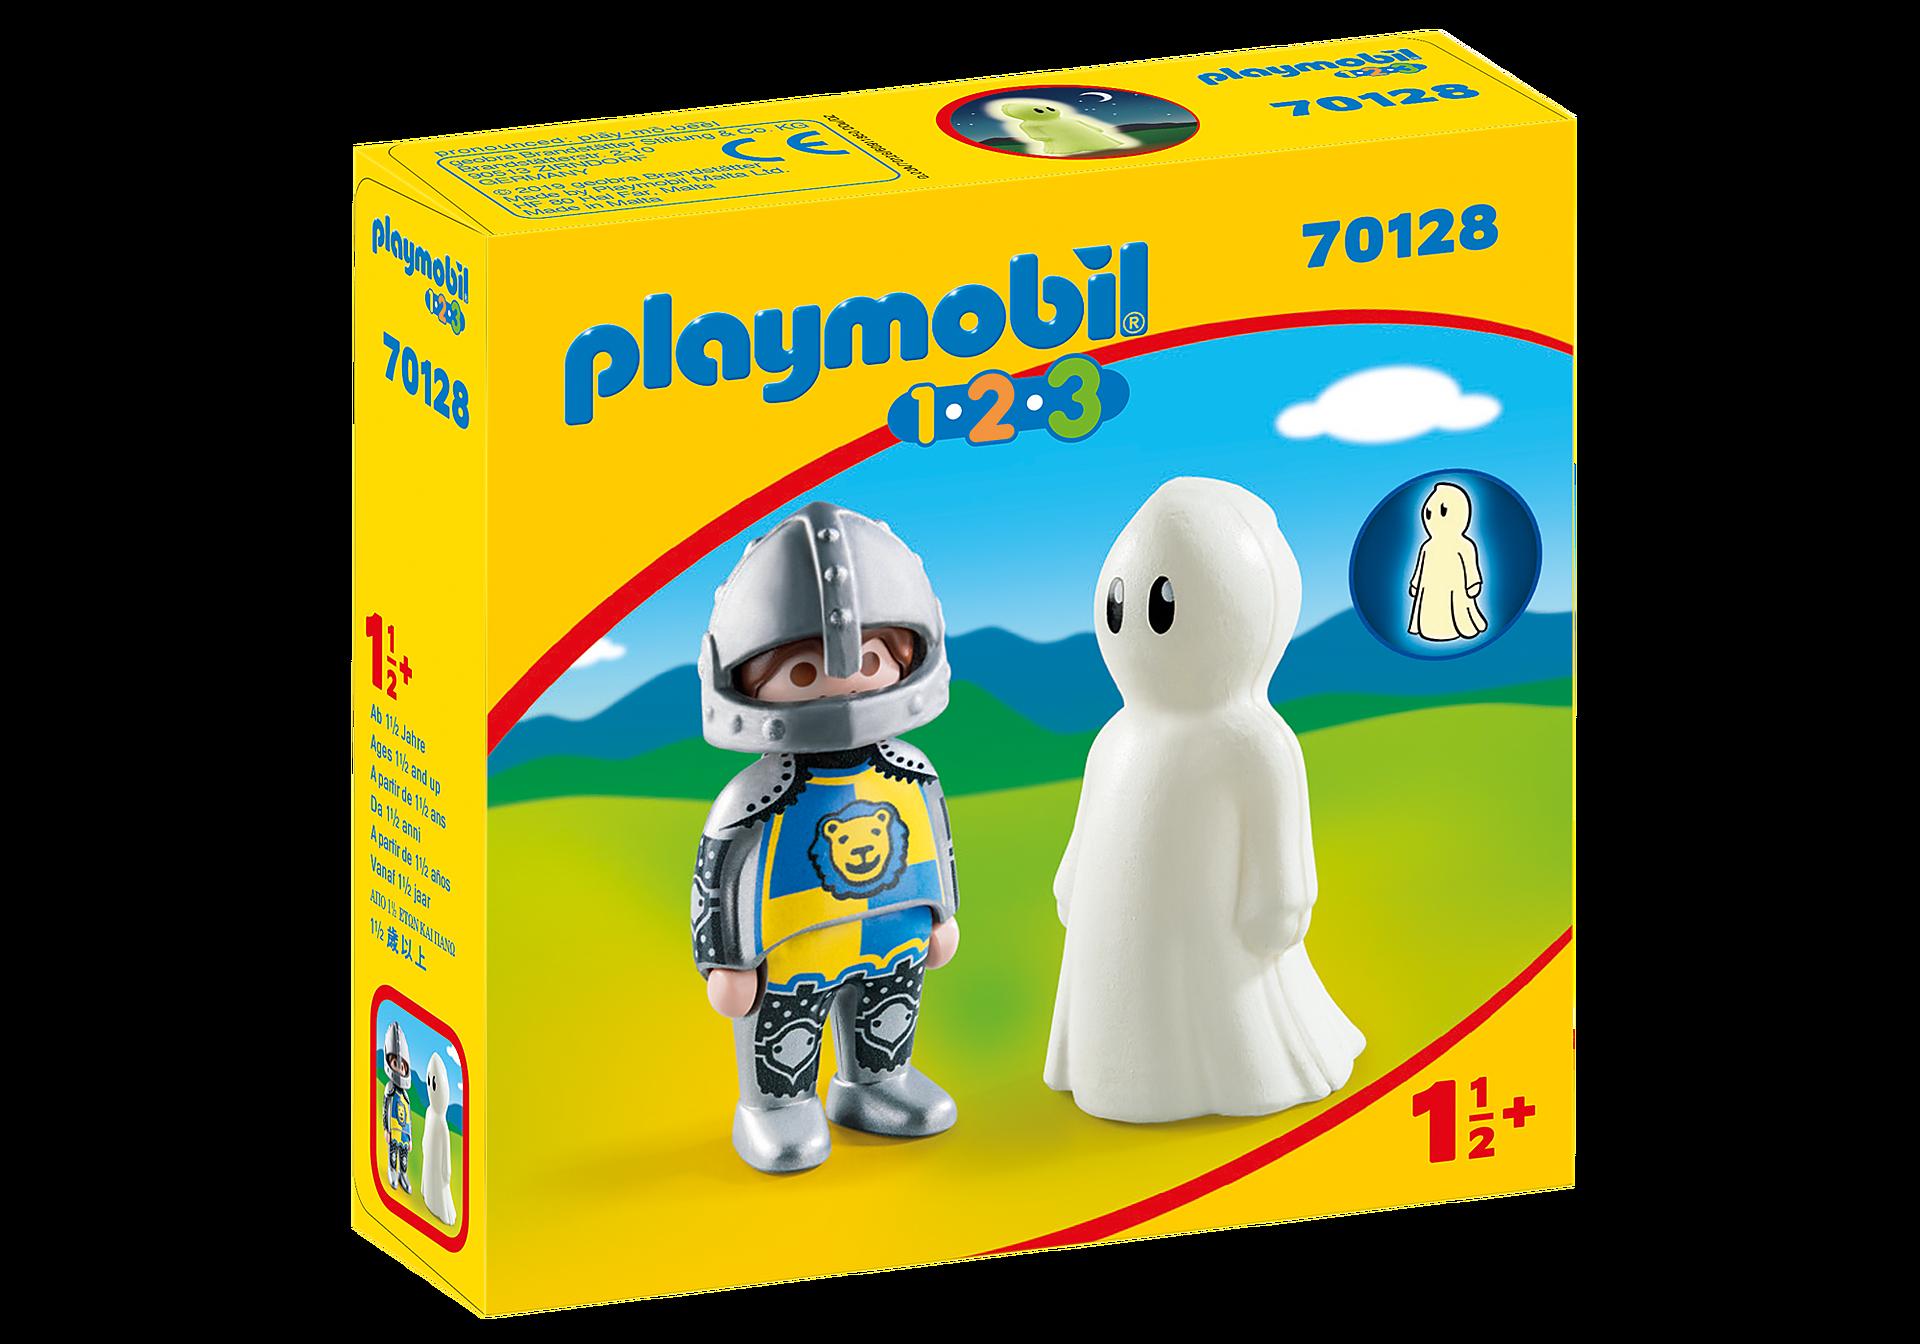 70128 Chevalier et fantôme  zoom image2